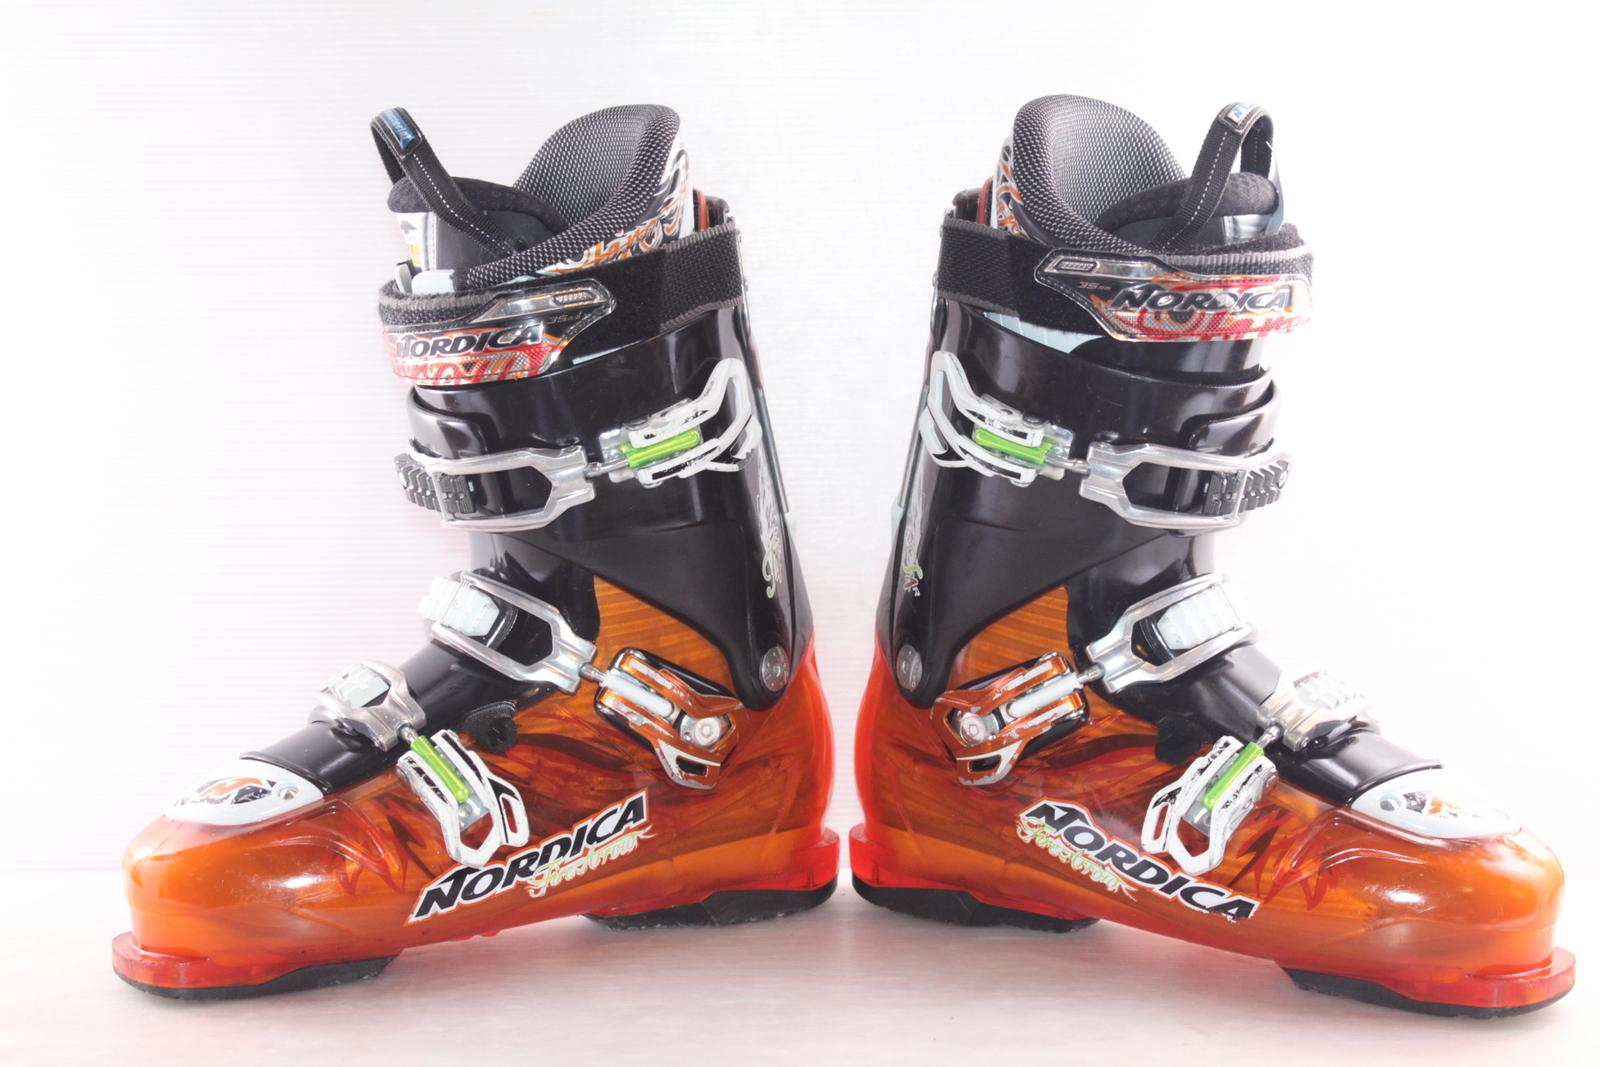 Lyžařské boty Nordica  Fire Arrow F4R vel. EU44.5 flexe 80